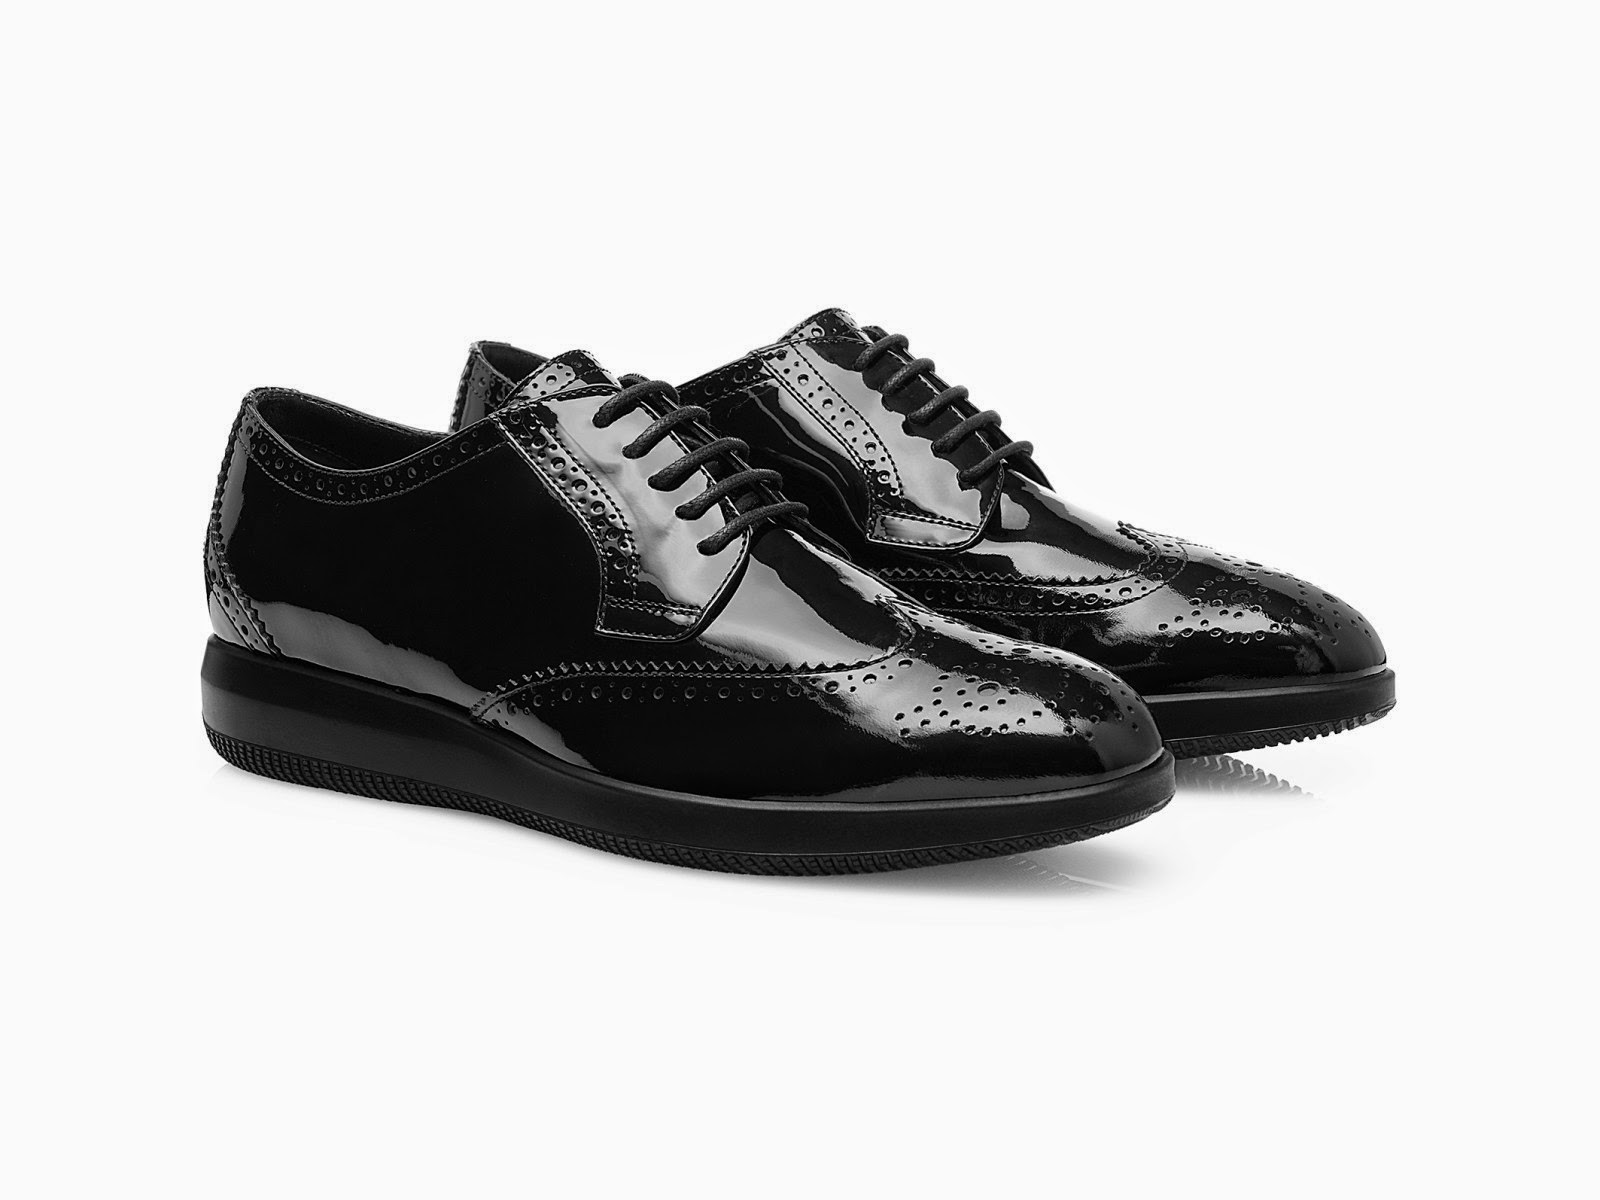 Outlet online di scarpe di marca: Outlet online scarpe ...